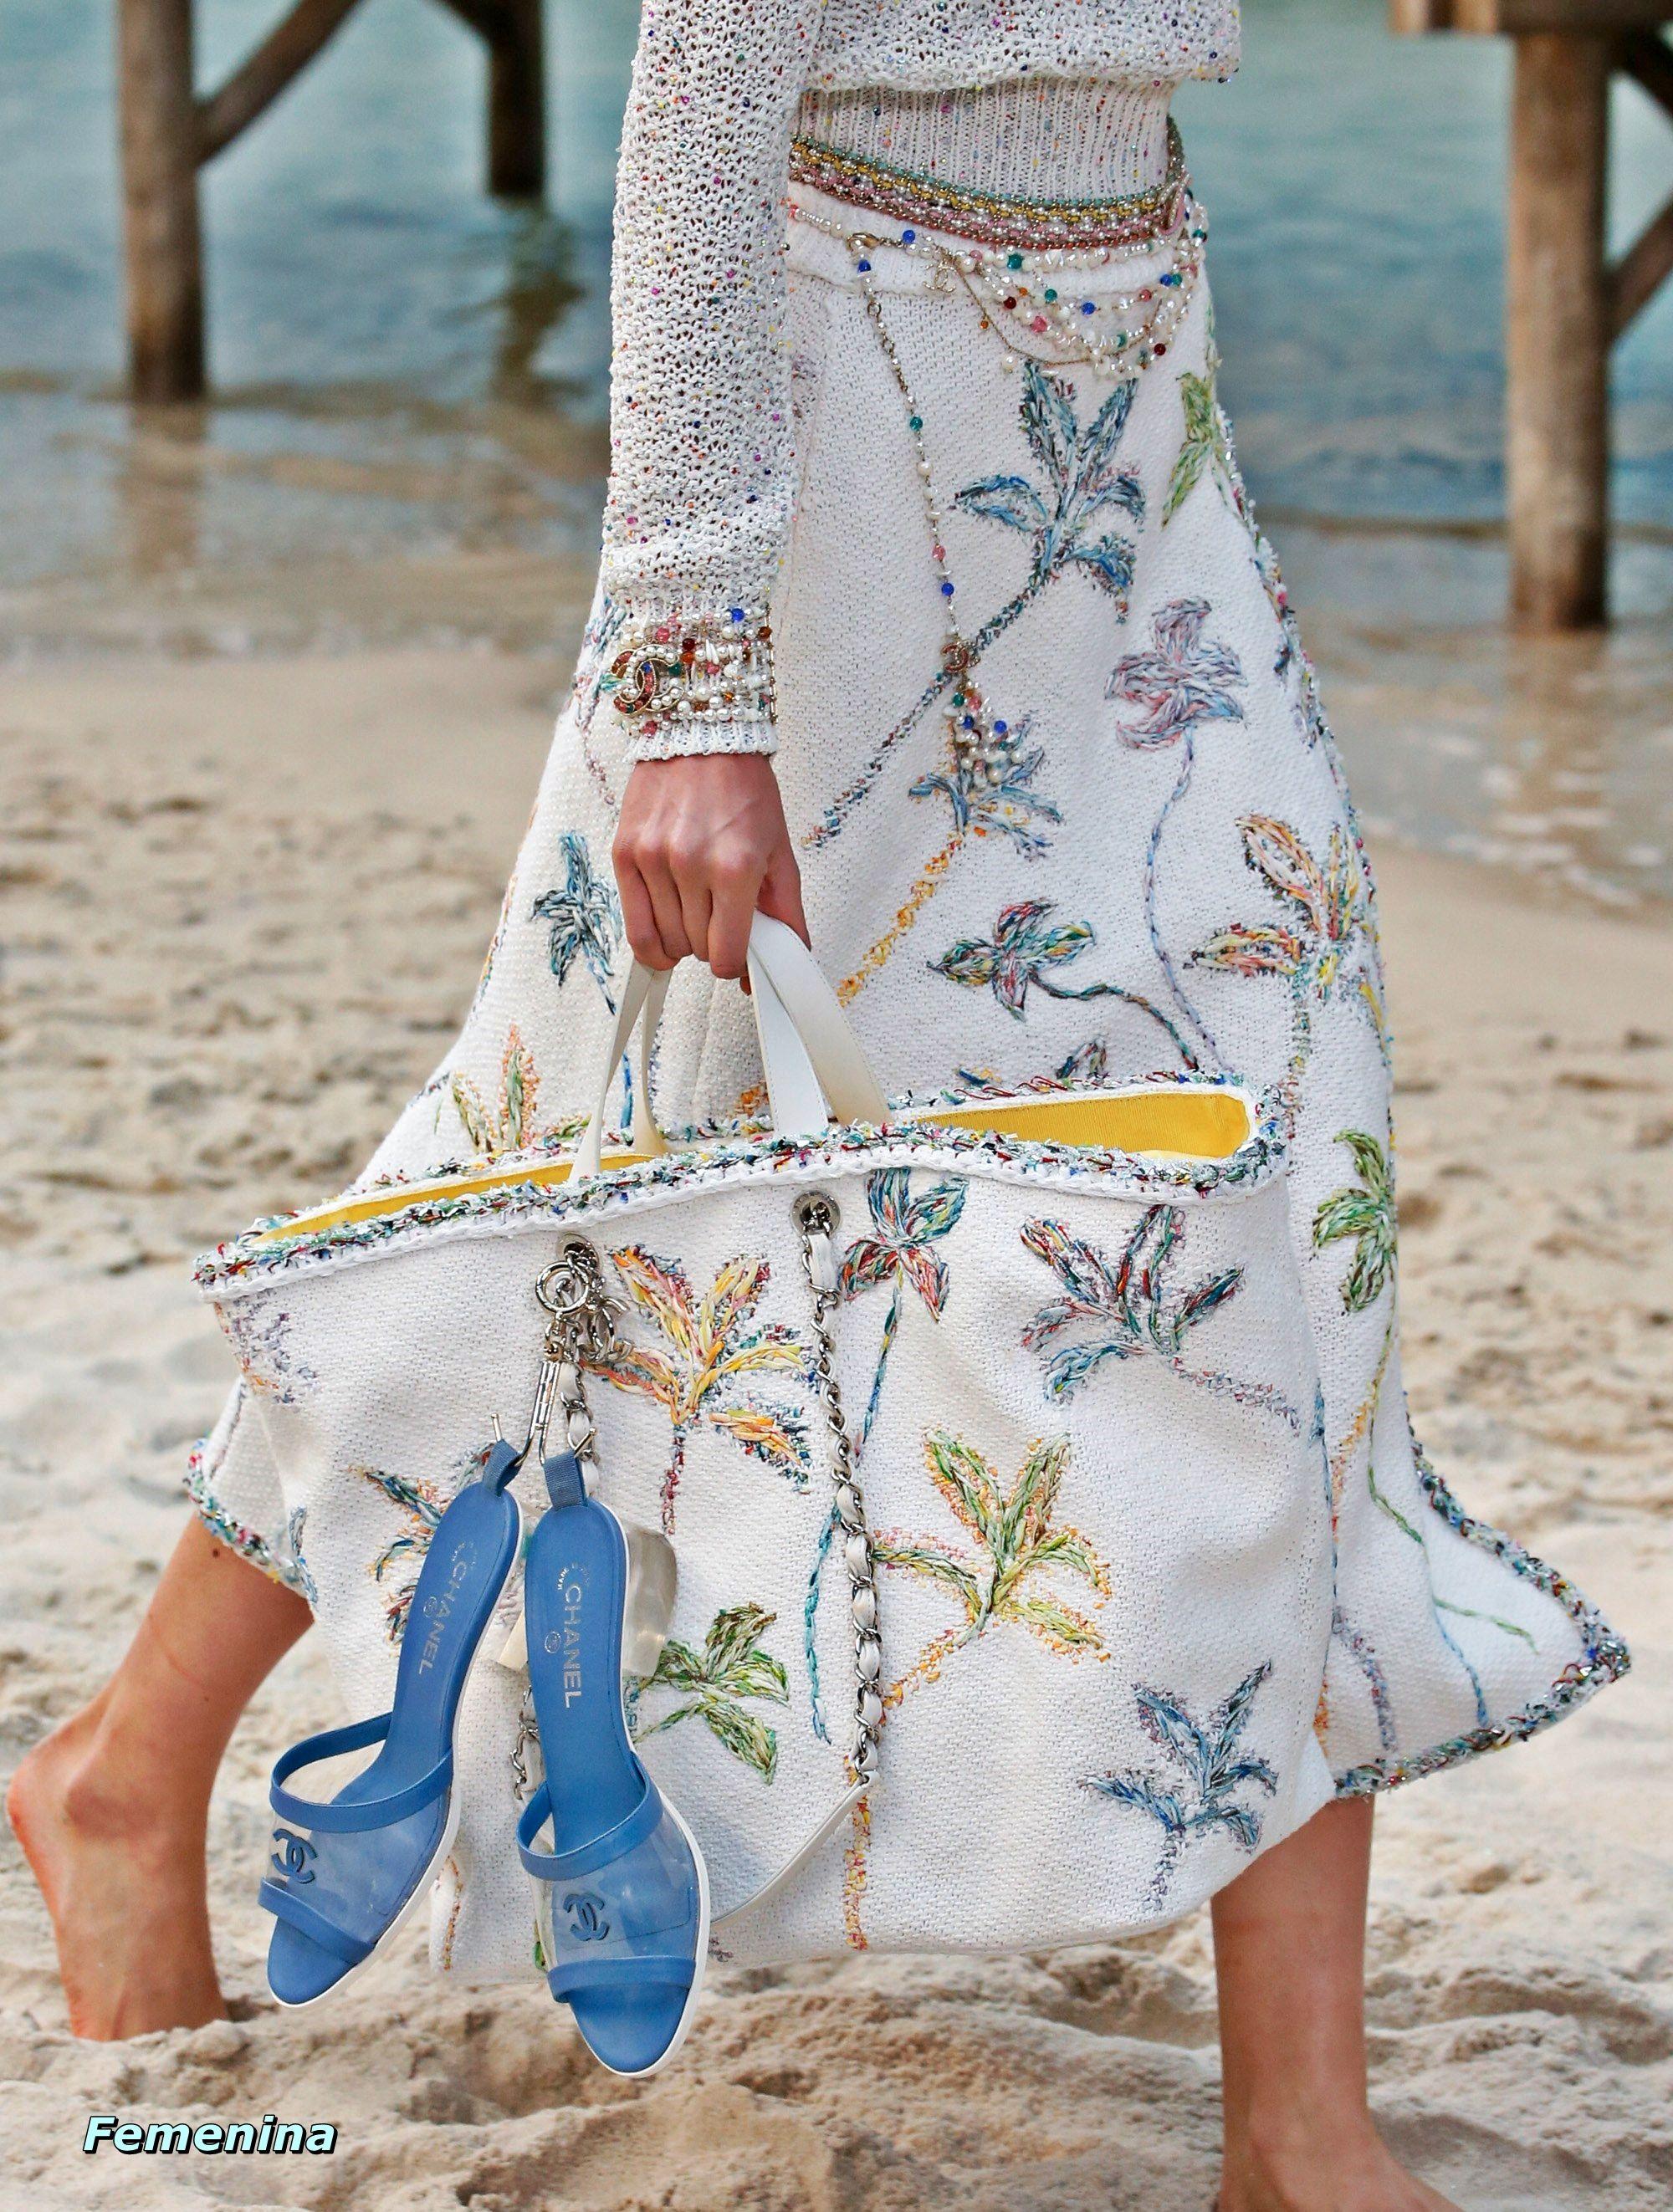 916124b24468 Chanel Spring Summer 2019 RTW -Details  bag